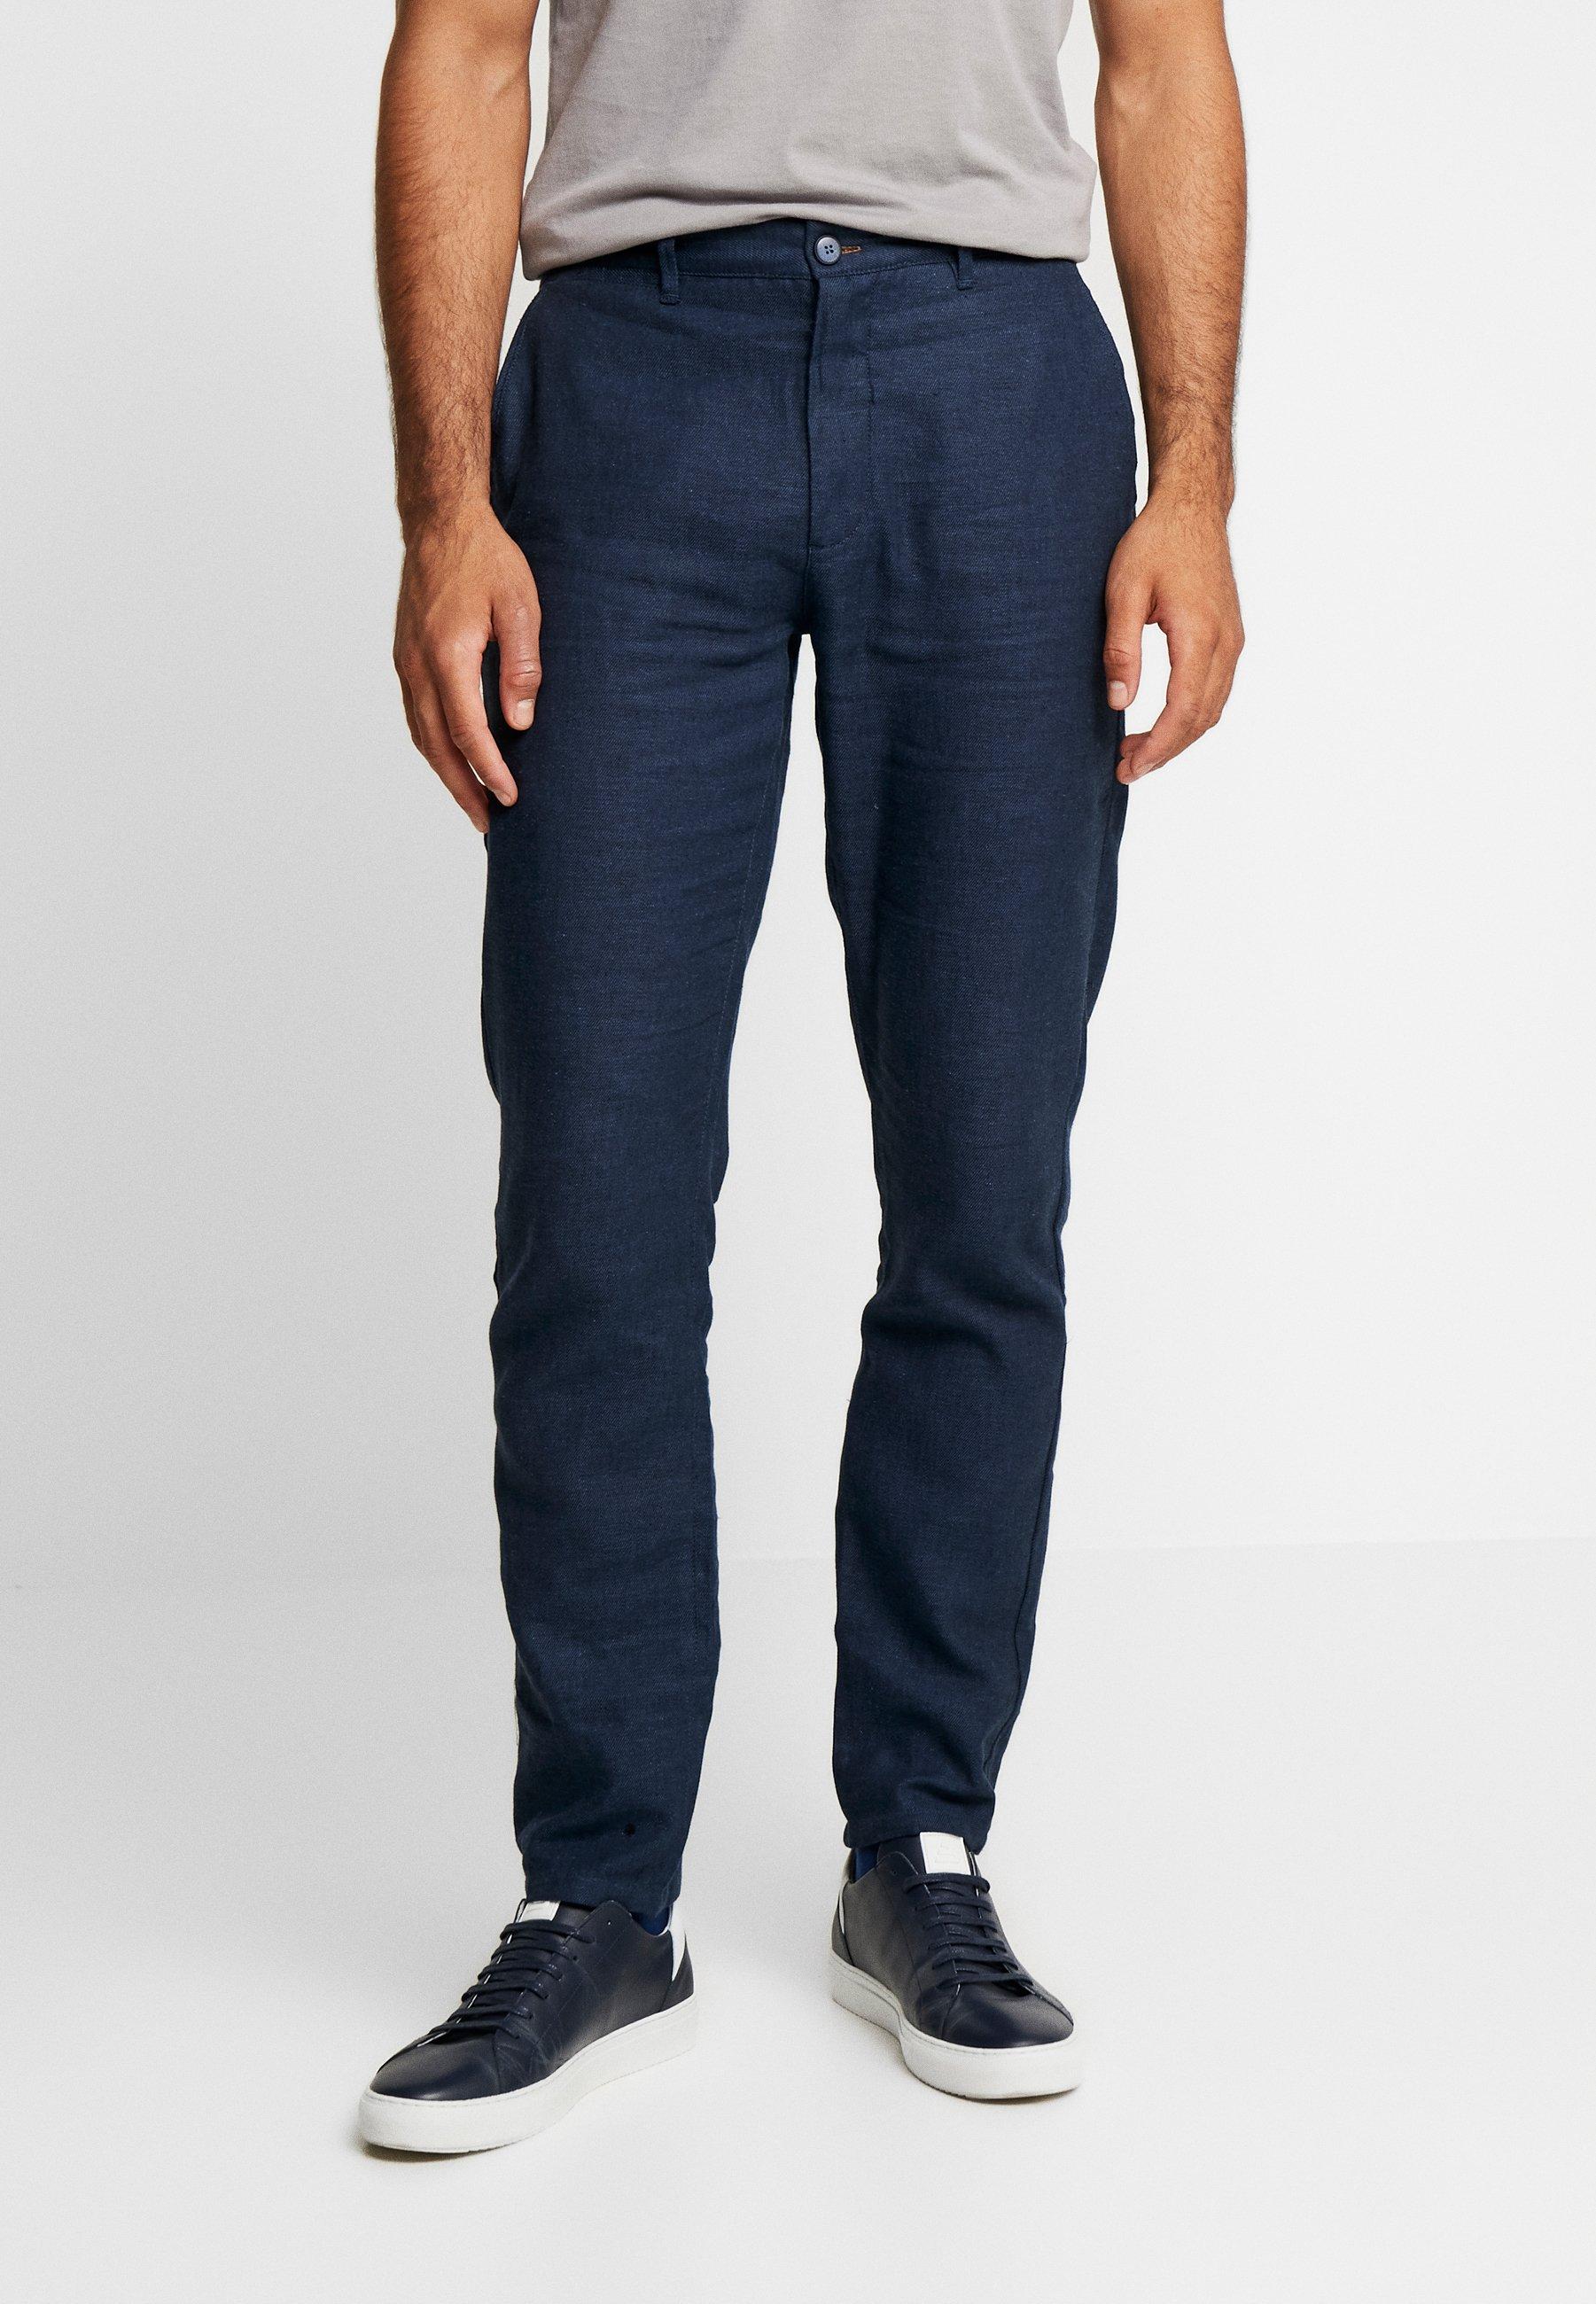 Pant Lino Classique Blue TailorPantalon Dark Springfield NX8Pkn0wO